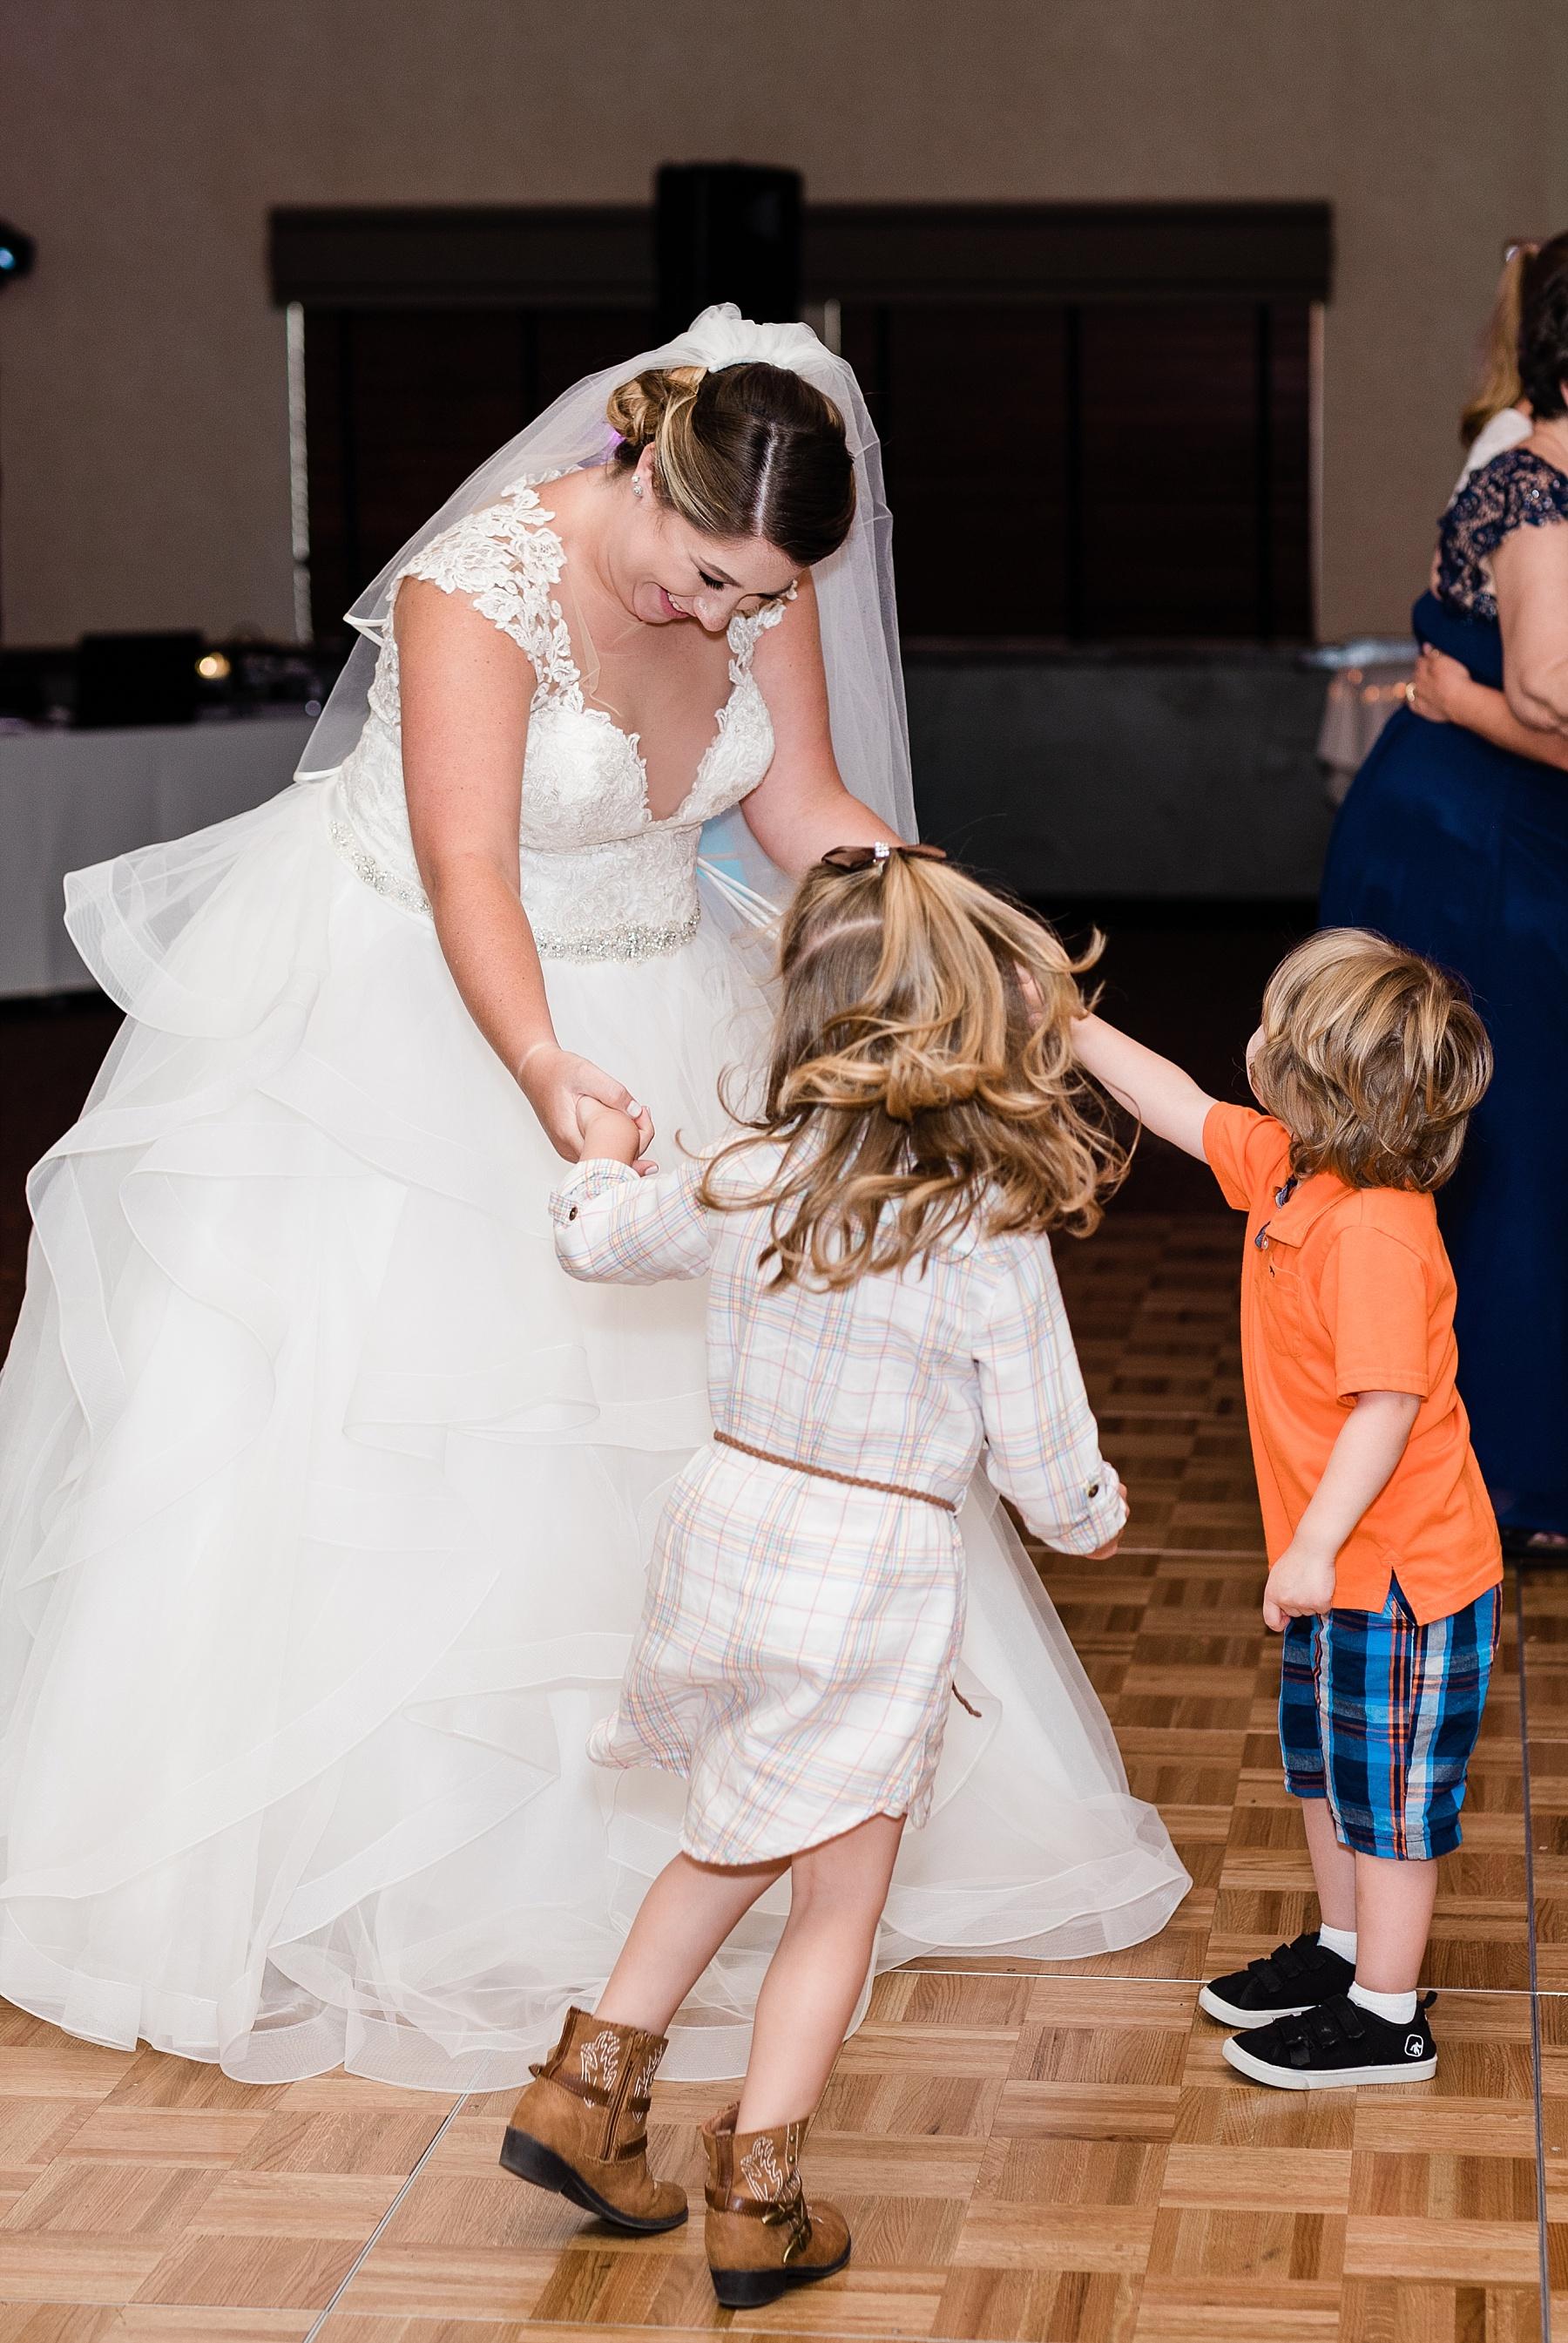 Baurichter Wedding at Stoney Creek Inn Columbia Missouri by Kelsi Kliethermes Photography_0031-1.jpg